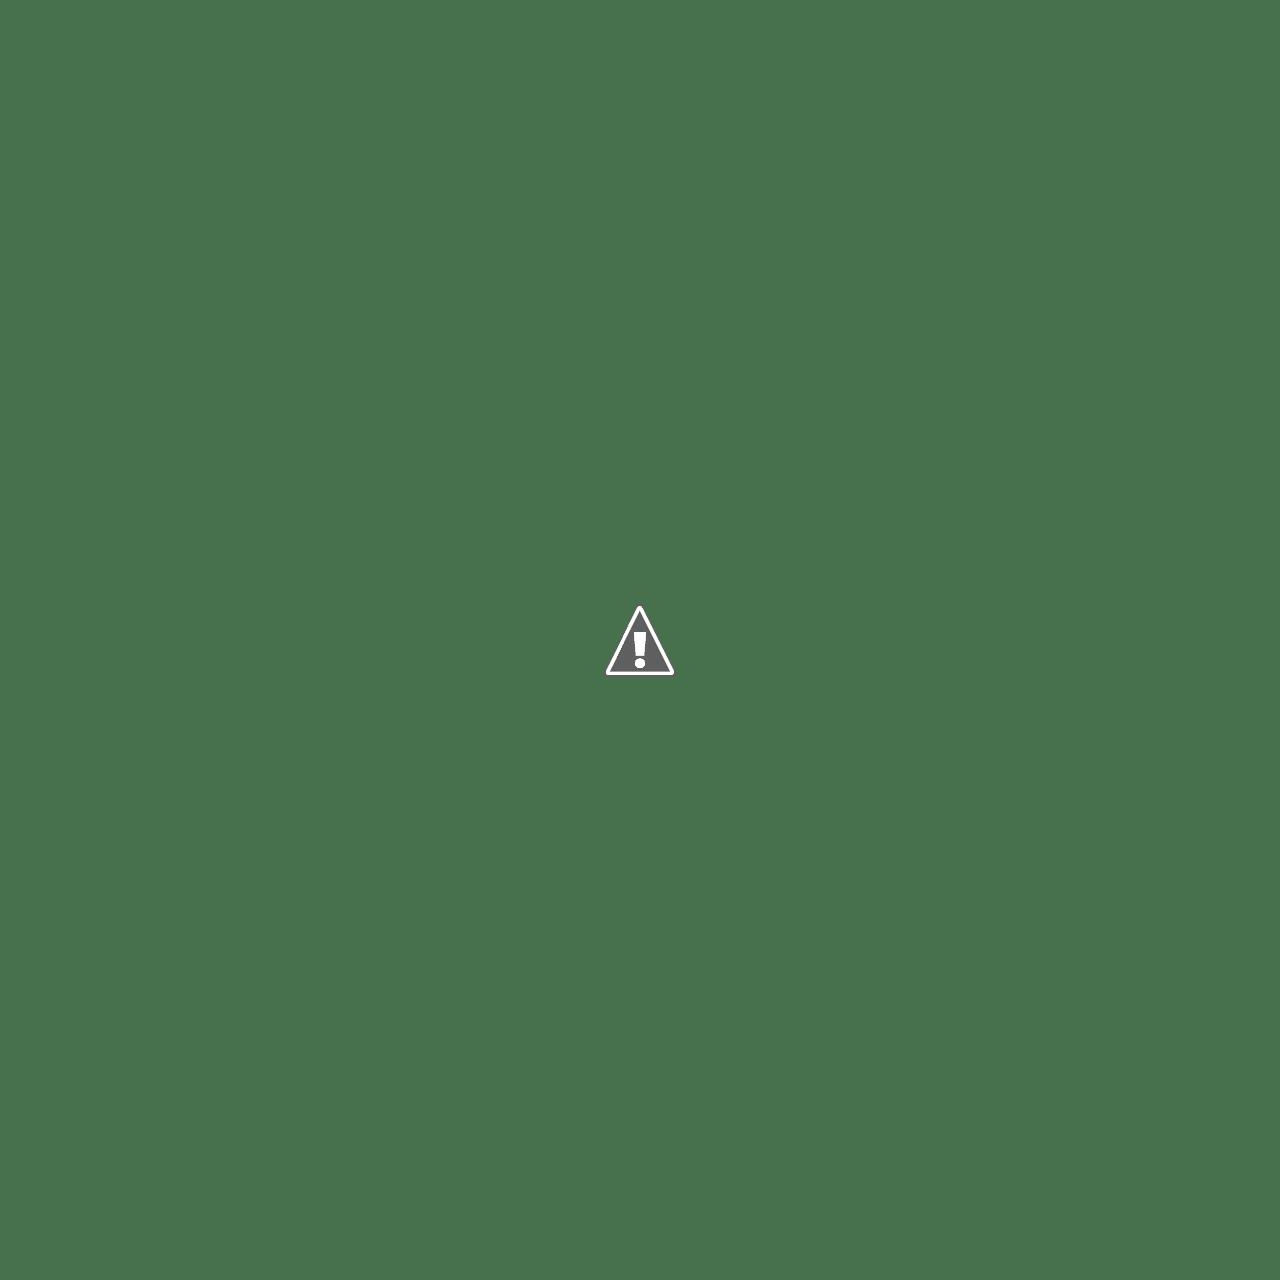 Desain Busana - Jasa design fashion, jasa pembuatan pola baju